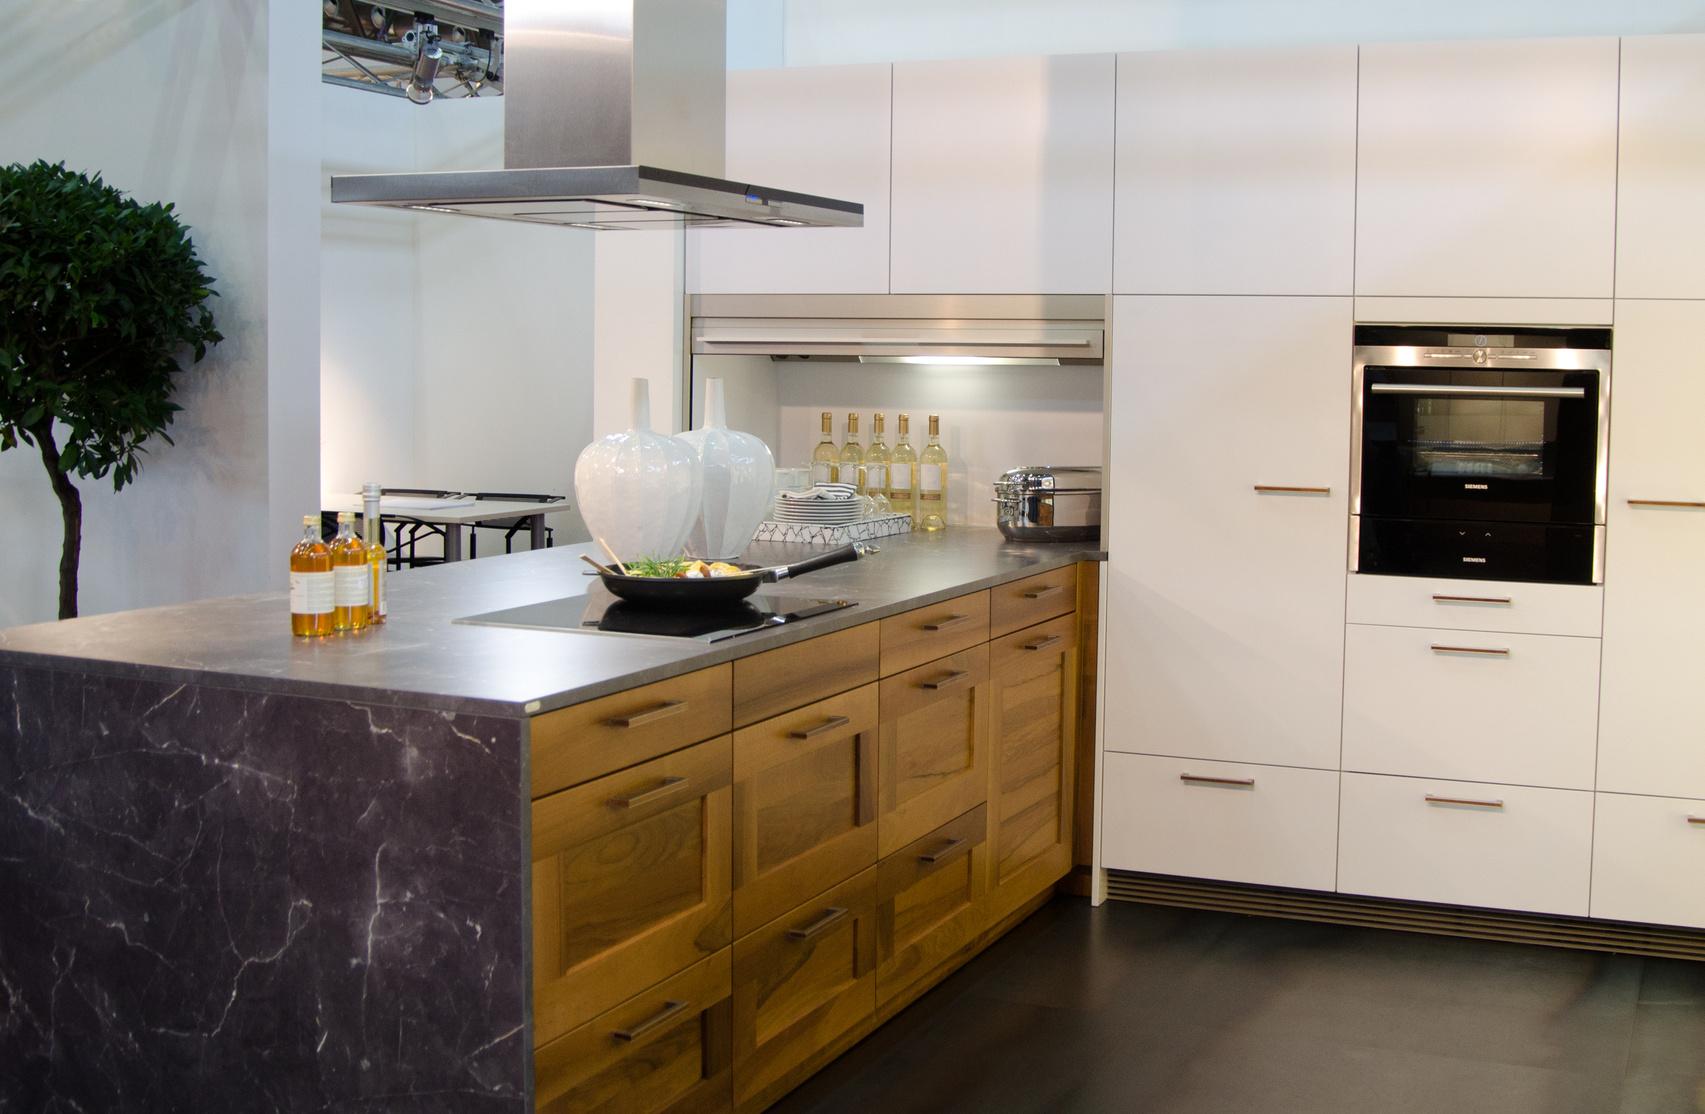 beautiful k chen in holzoptik images house design ideas. Black Bedroom Furniture Sets. Home Design Ideas